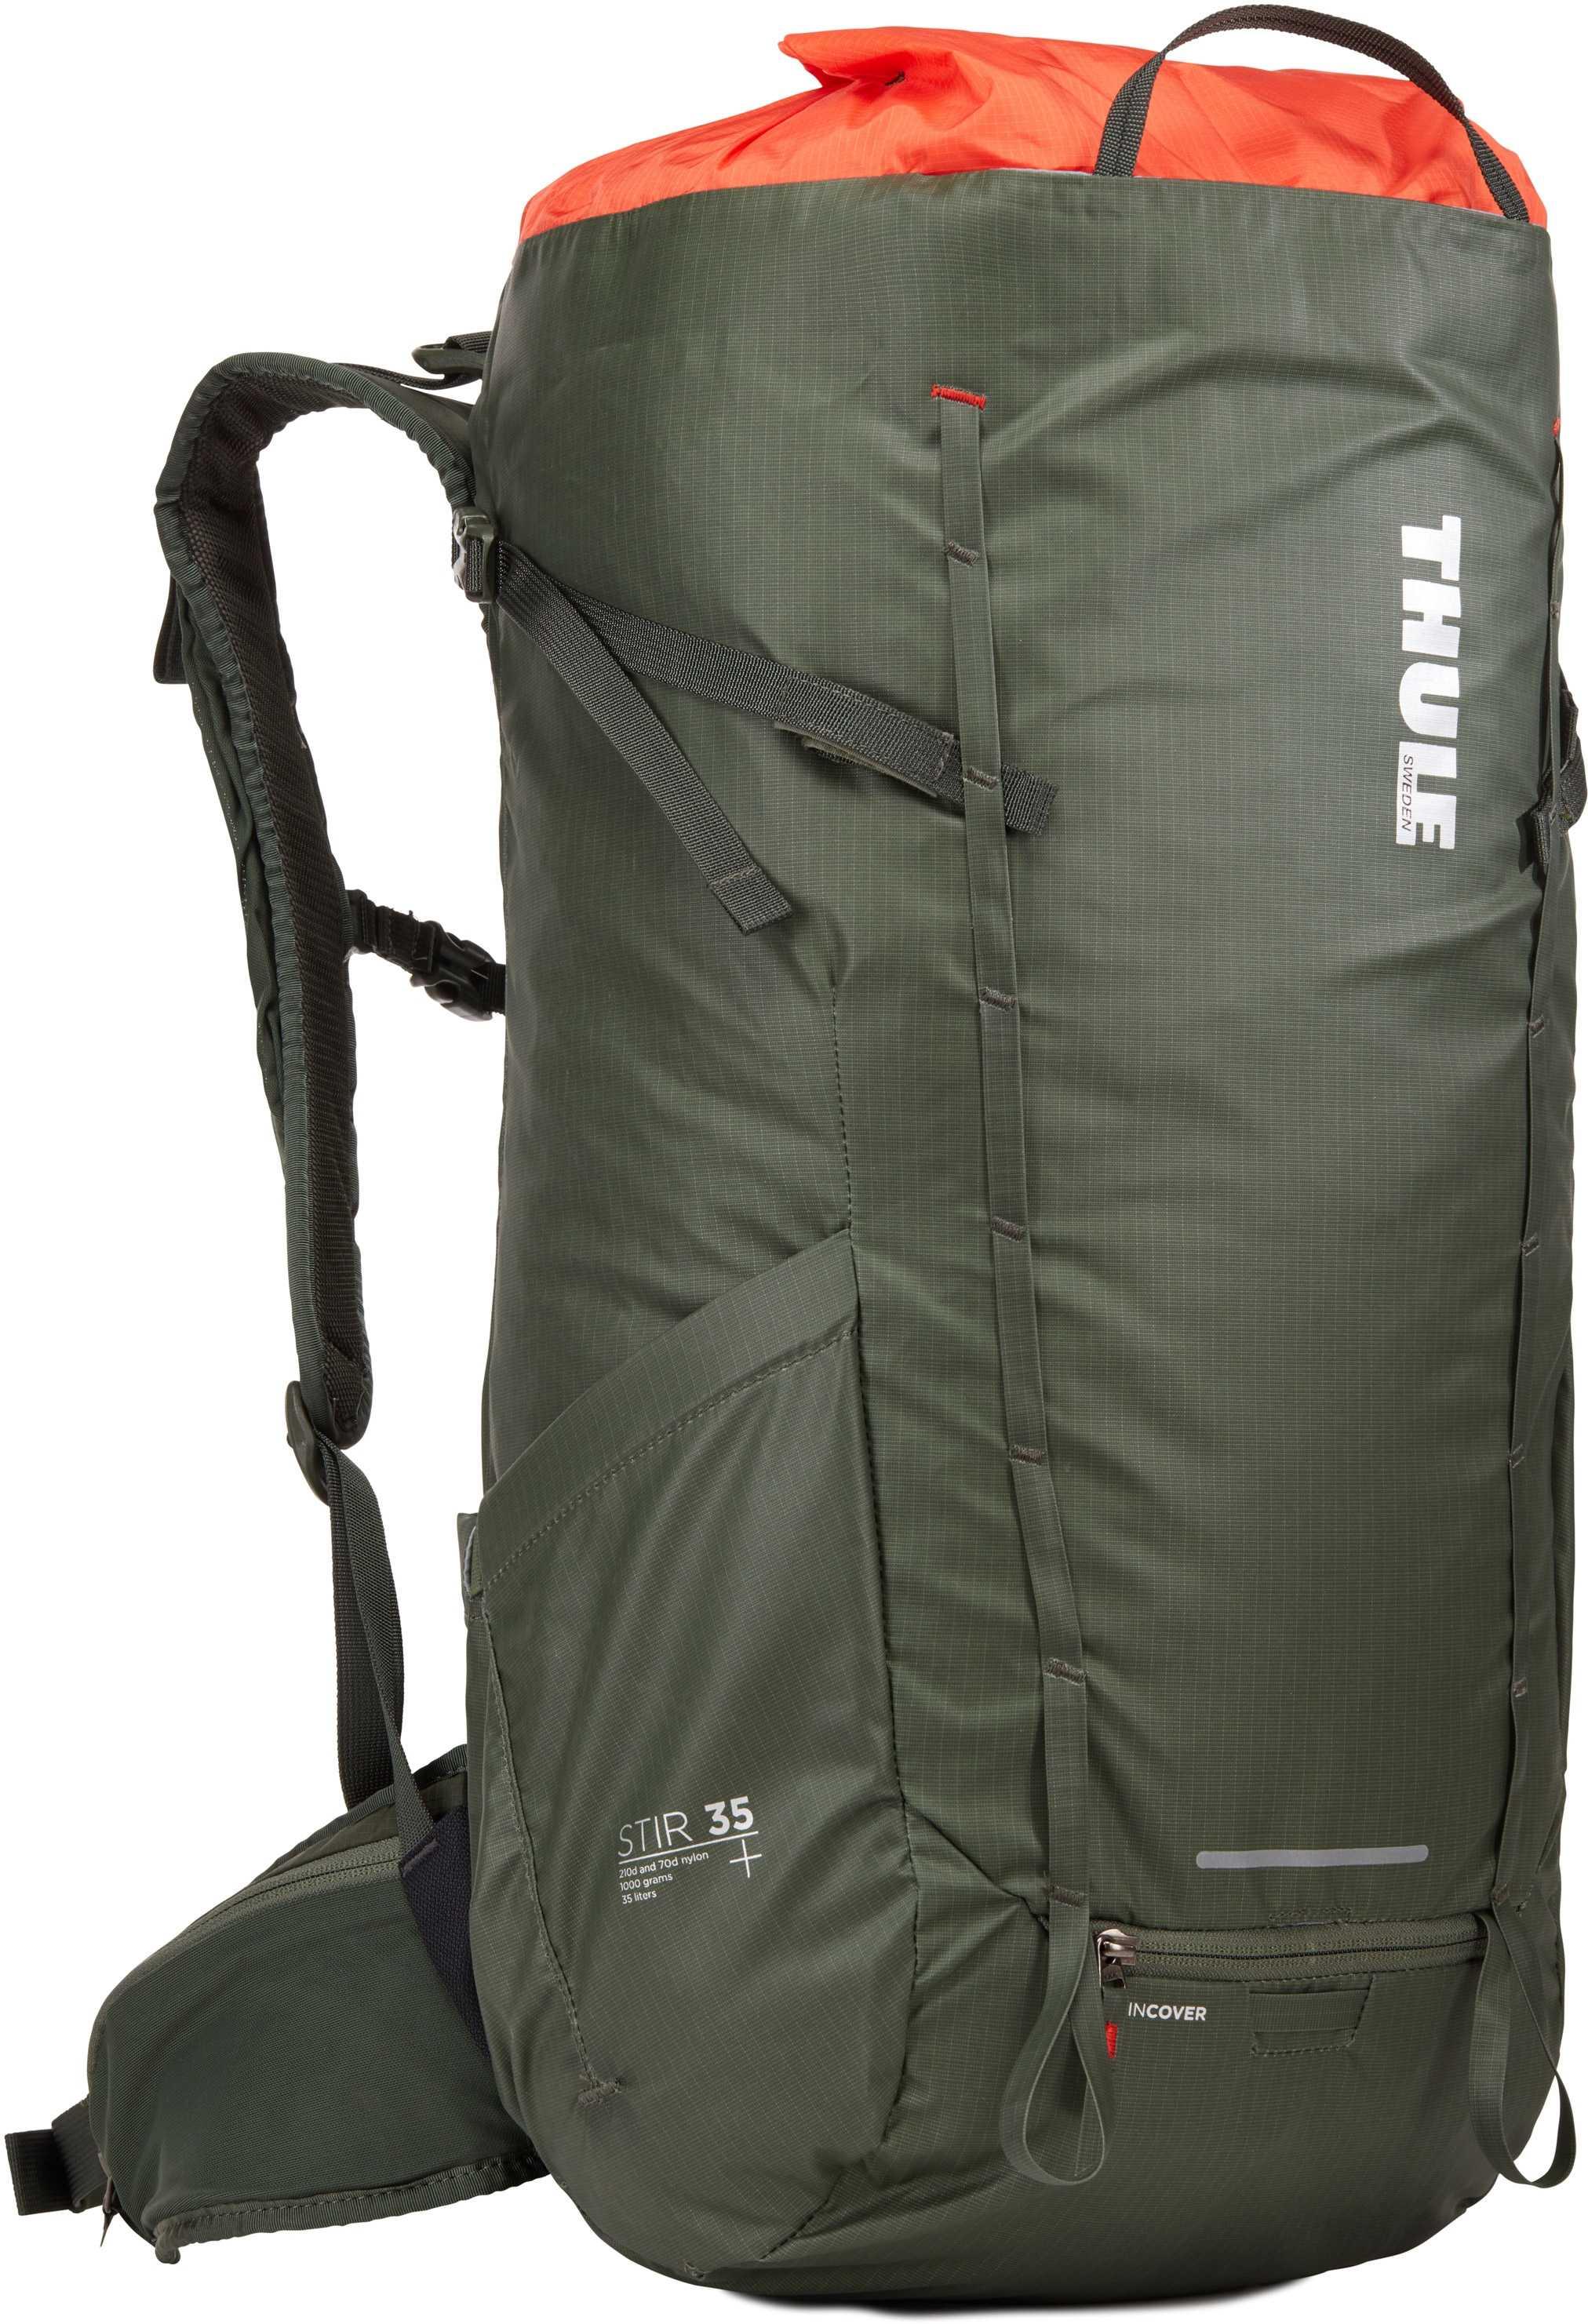 Rygsæk Thule Stir 35 l herre grøn   Travel bags